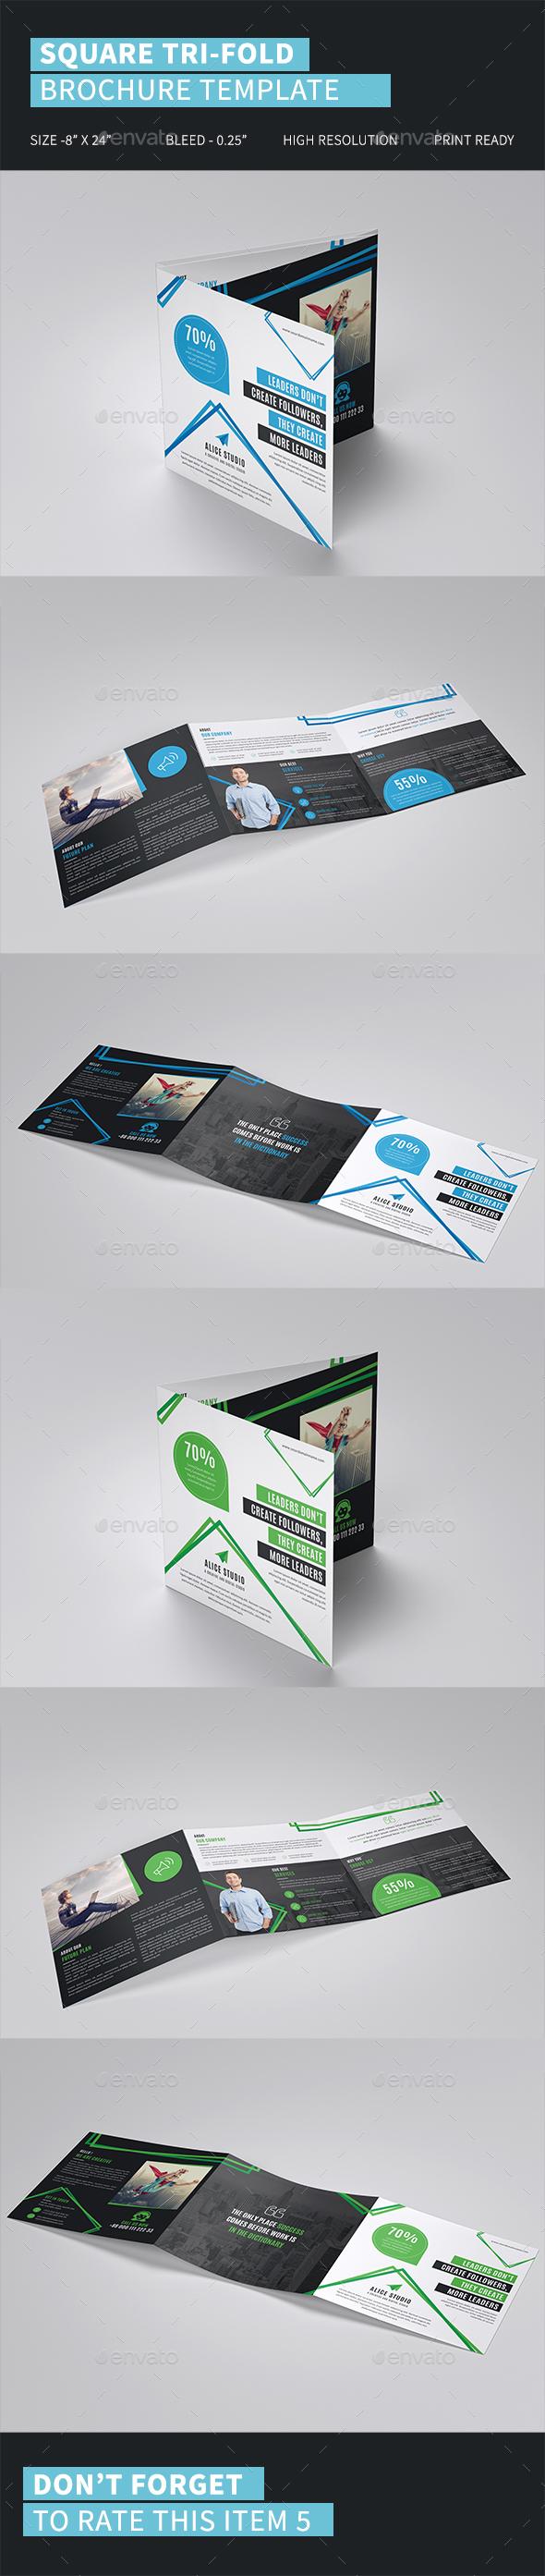 Square Tri-Fold Brochure Template - Corporate Brochures